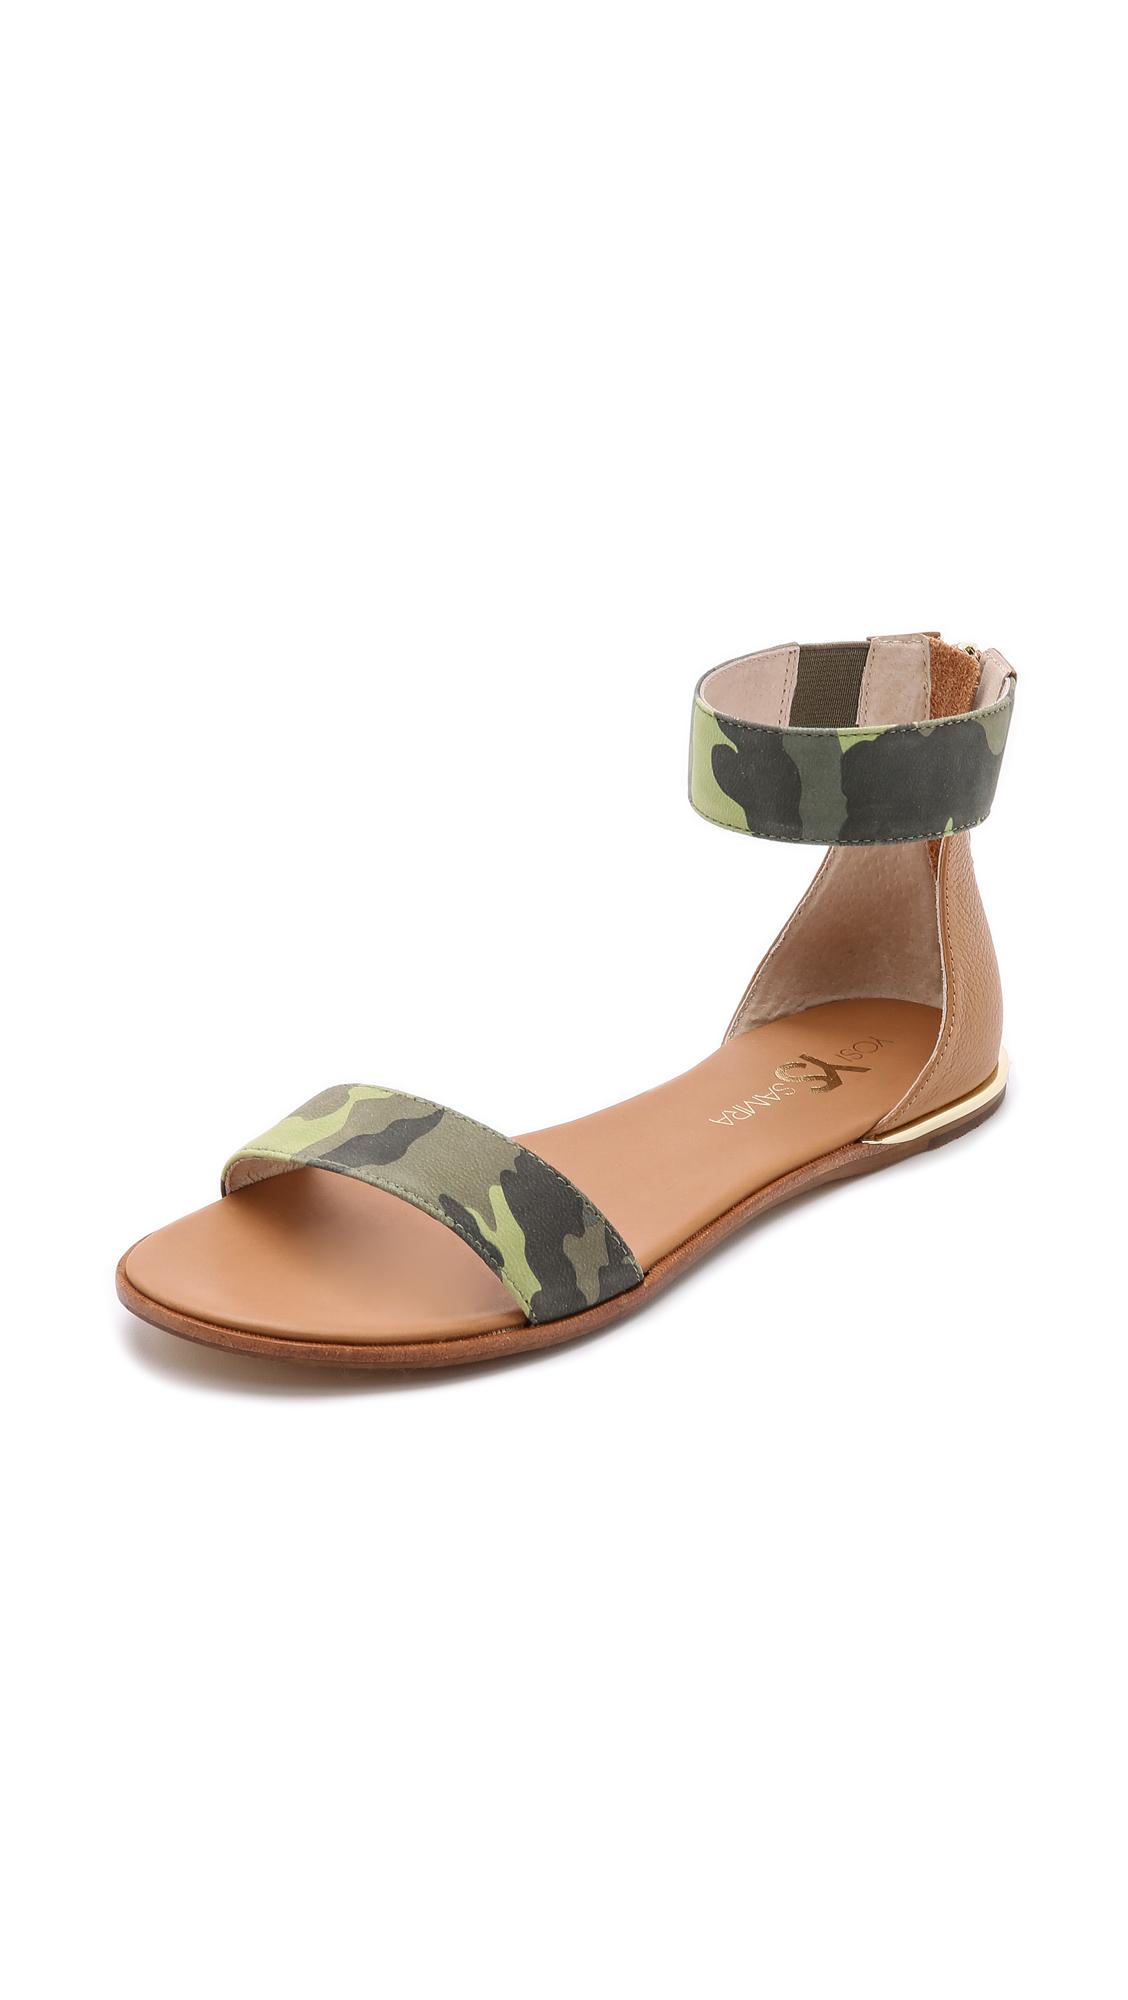 e934debc5f477 Lyst - Yosi Samra Cambelle Camo Flat Sandals - Limette sienna in Green